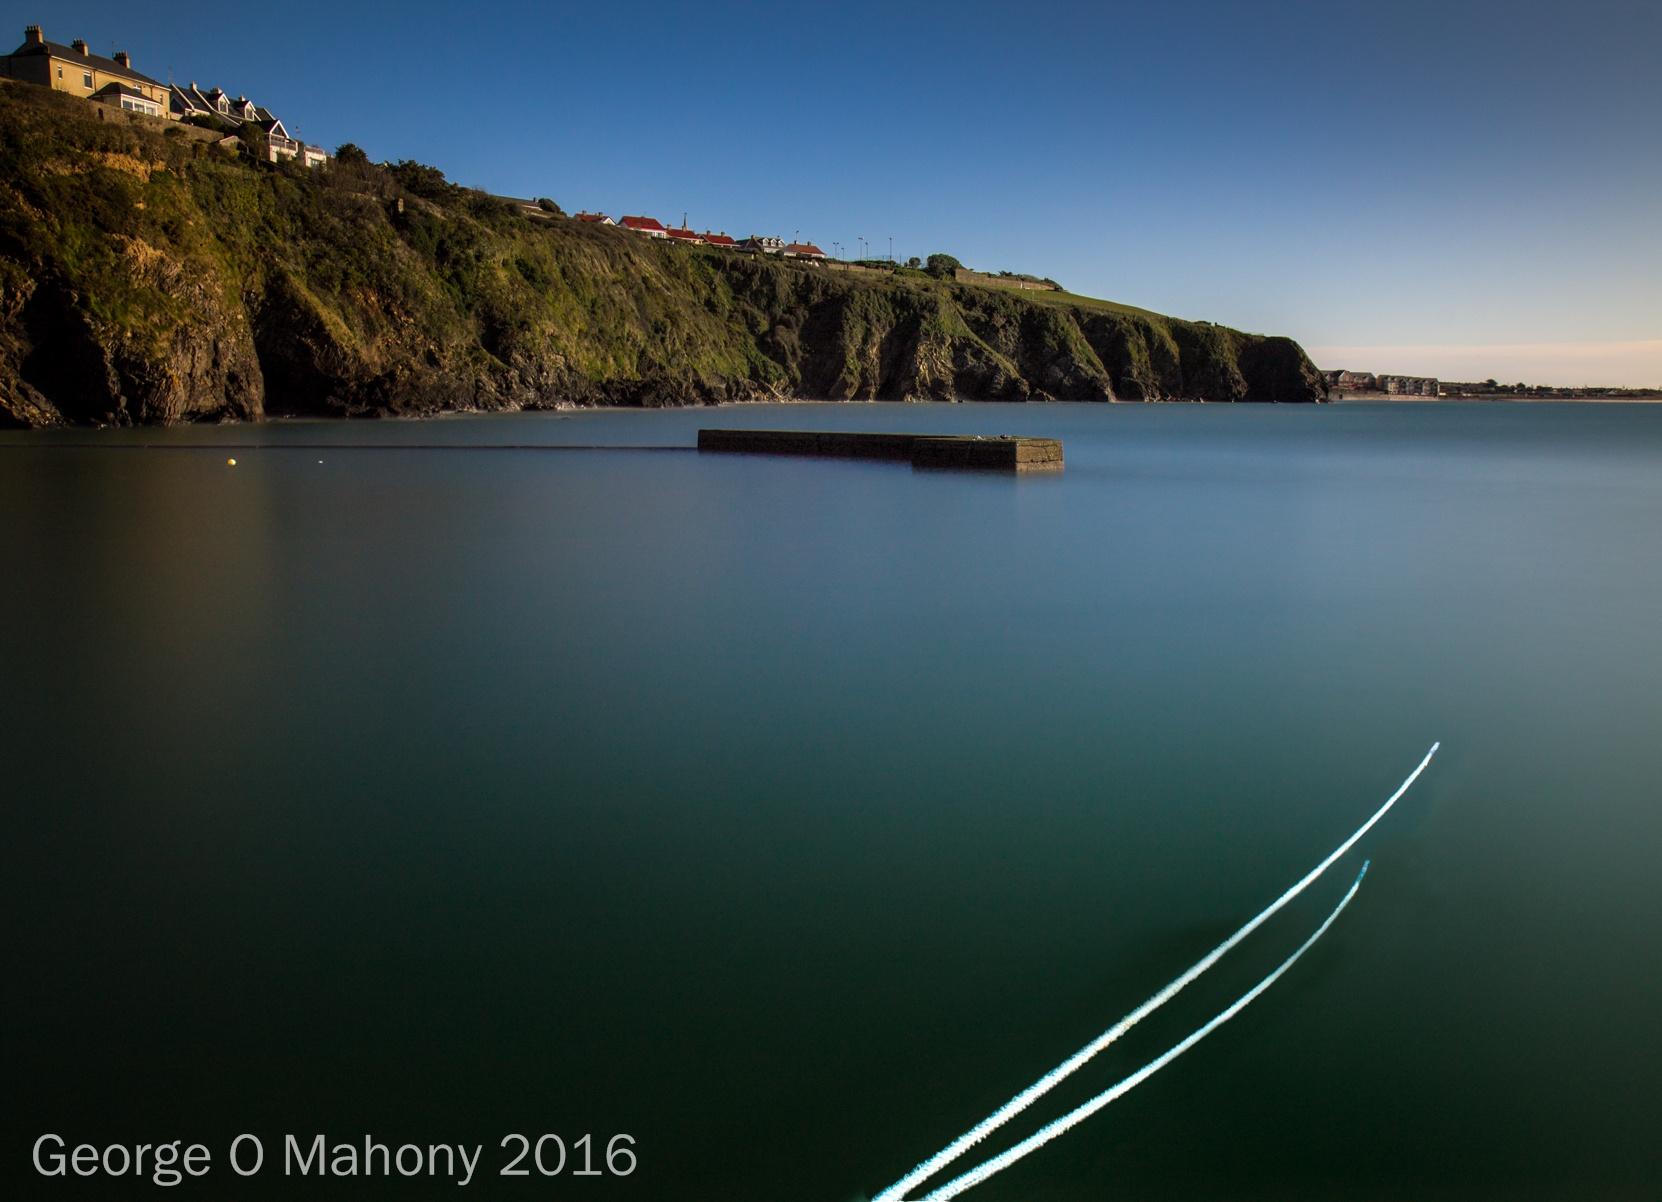 Calm Waters by Portlawslim